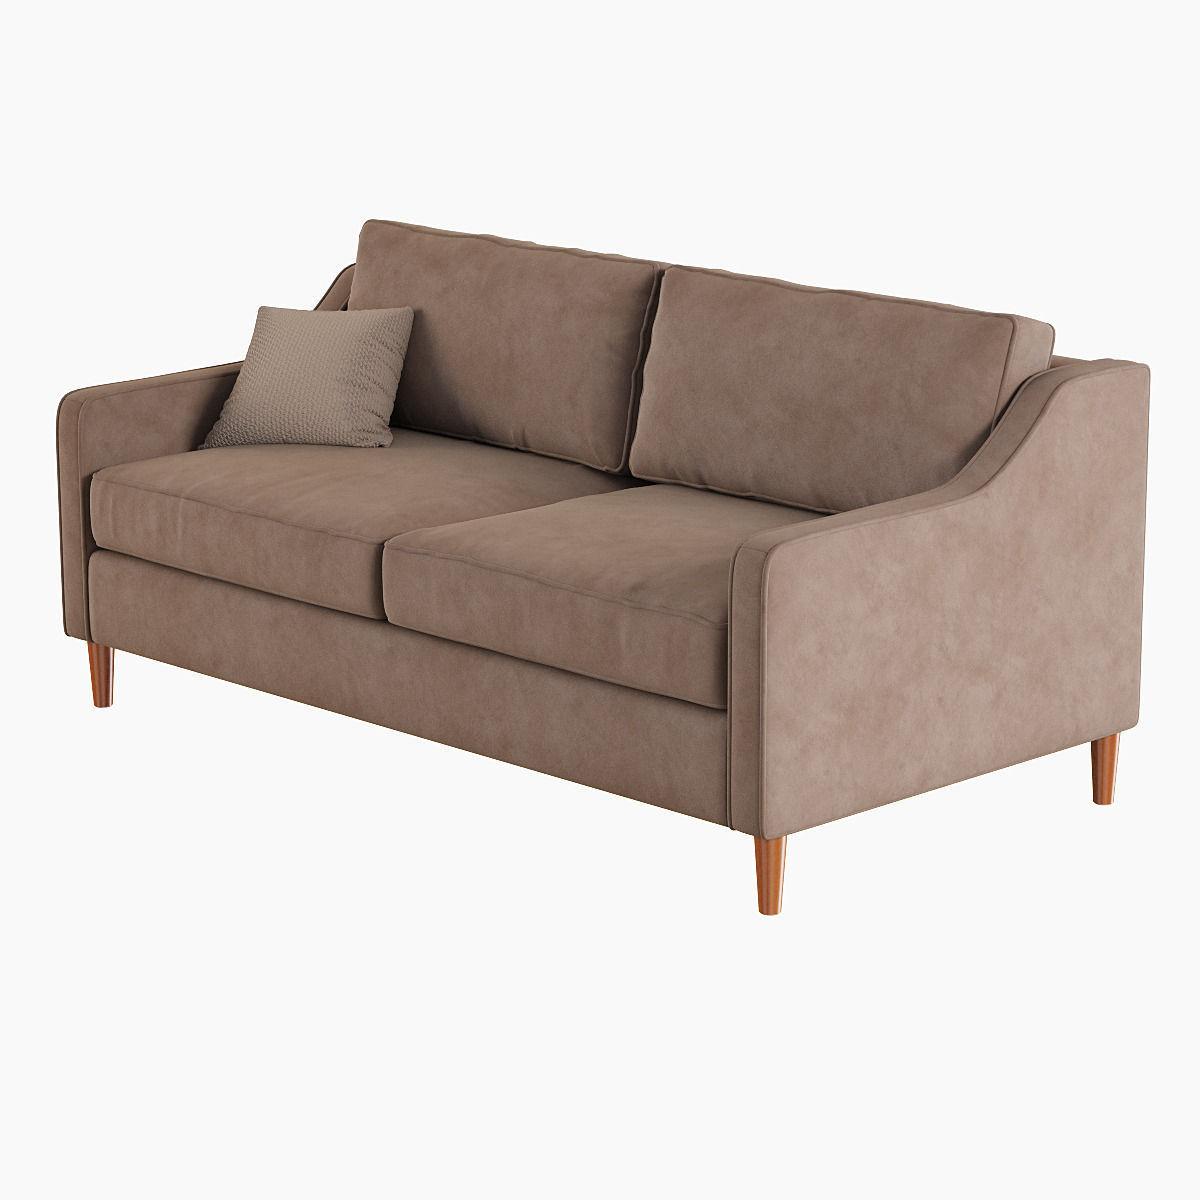 West elm paidge sofa 3d model max obj fbx for Elm furniture